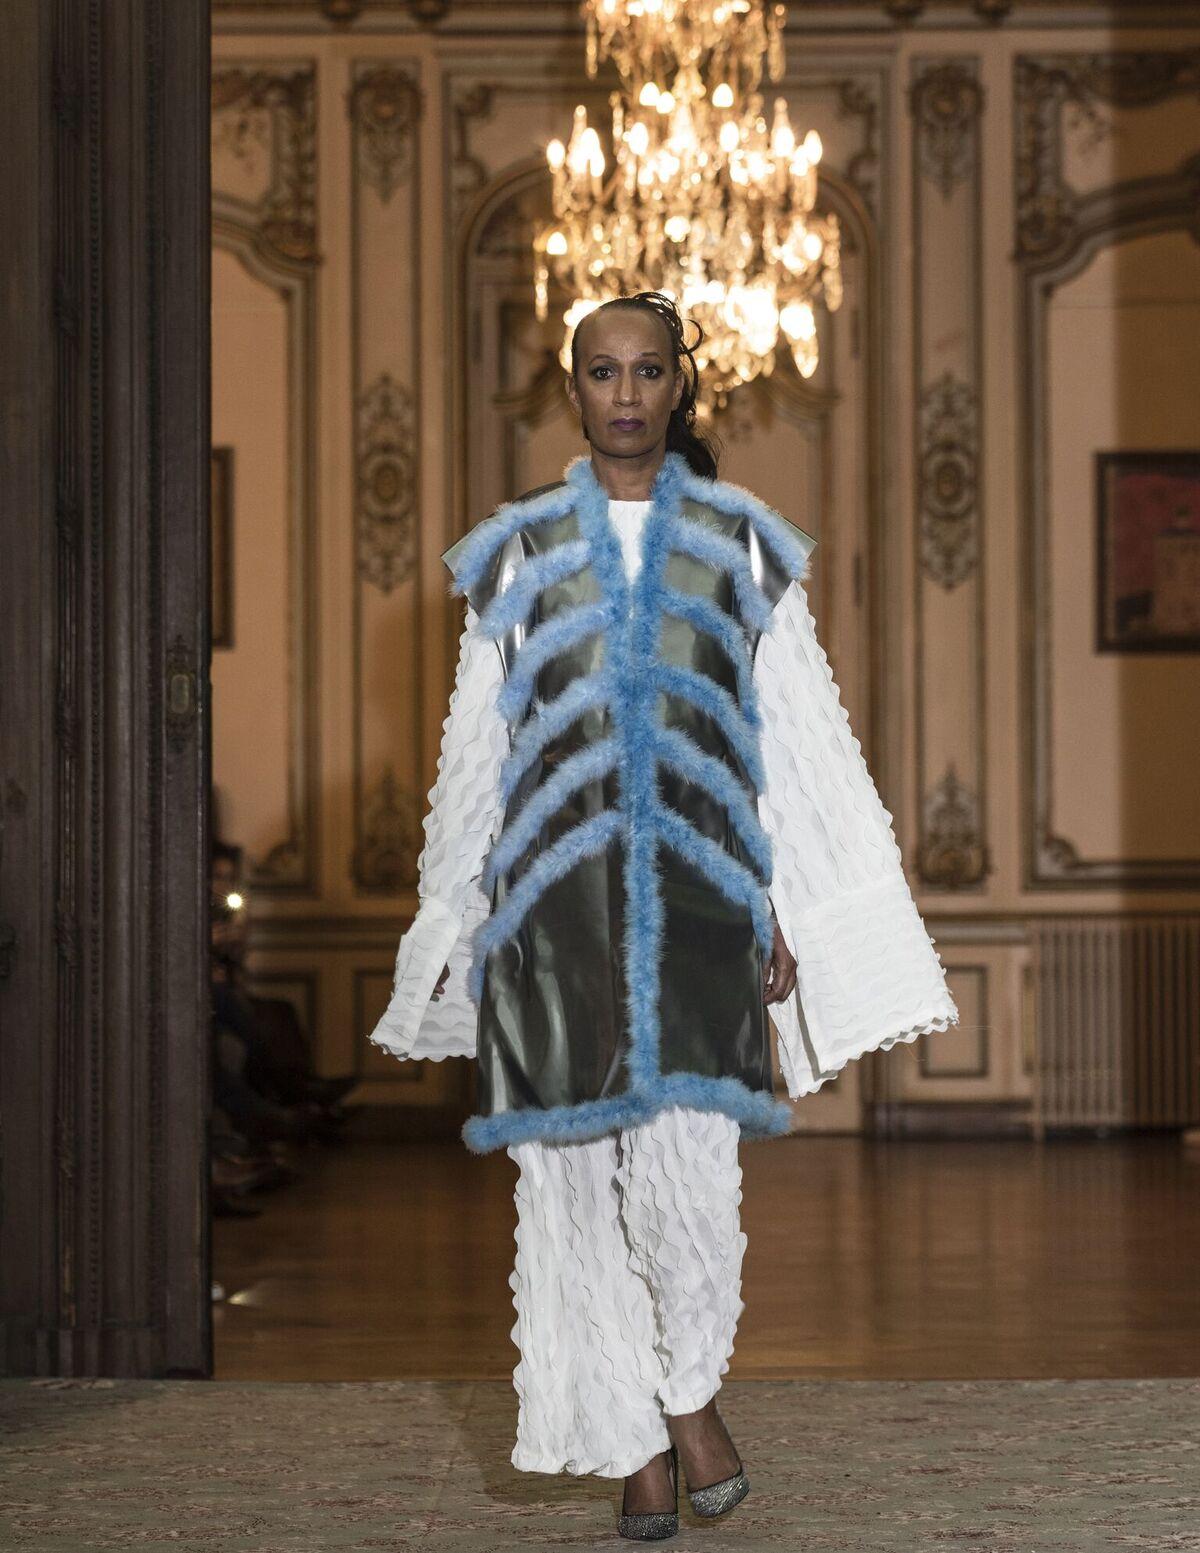 Shaleva freedom ss20 during paris fashion week (10)